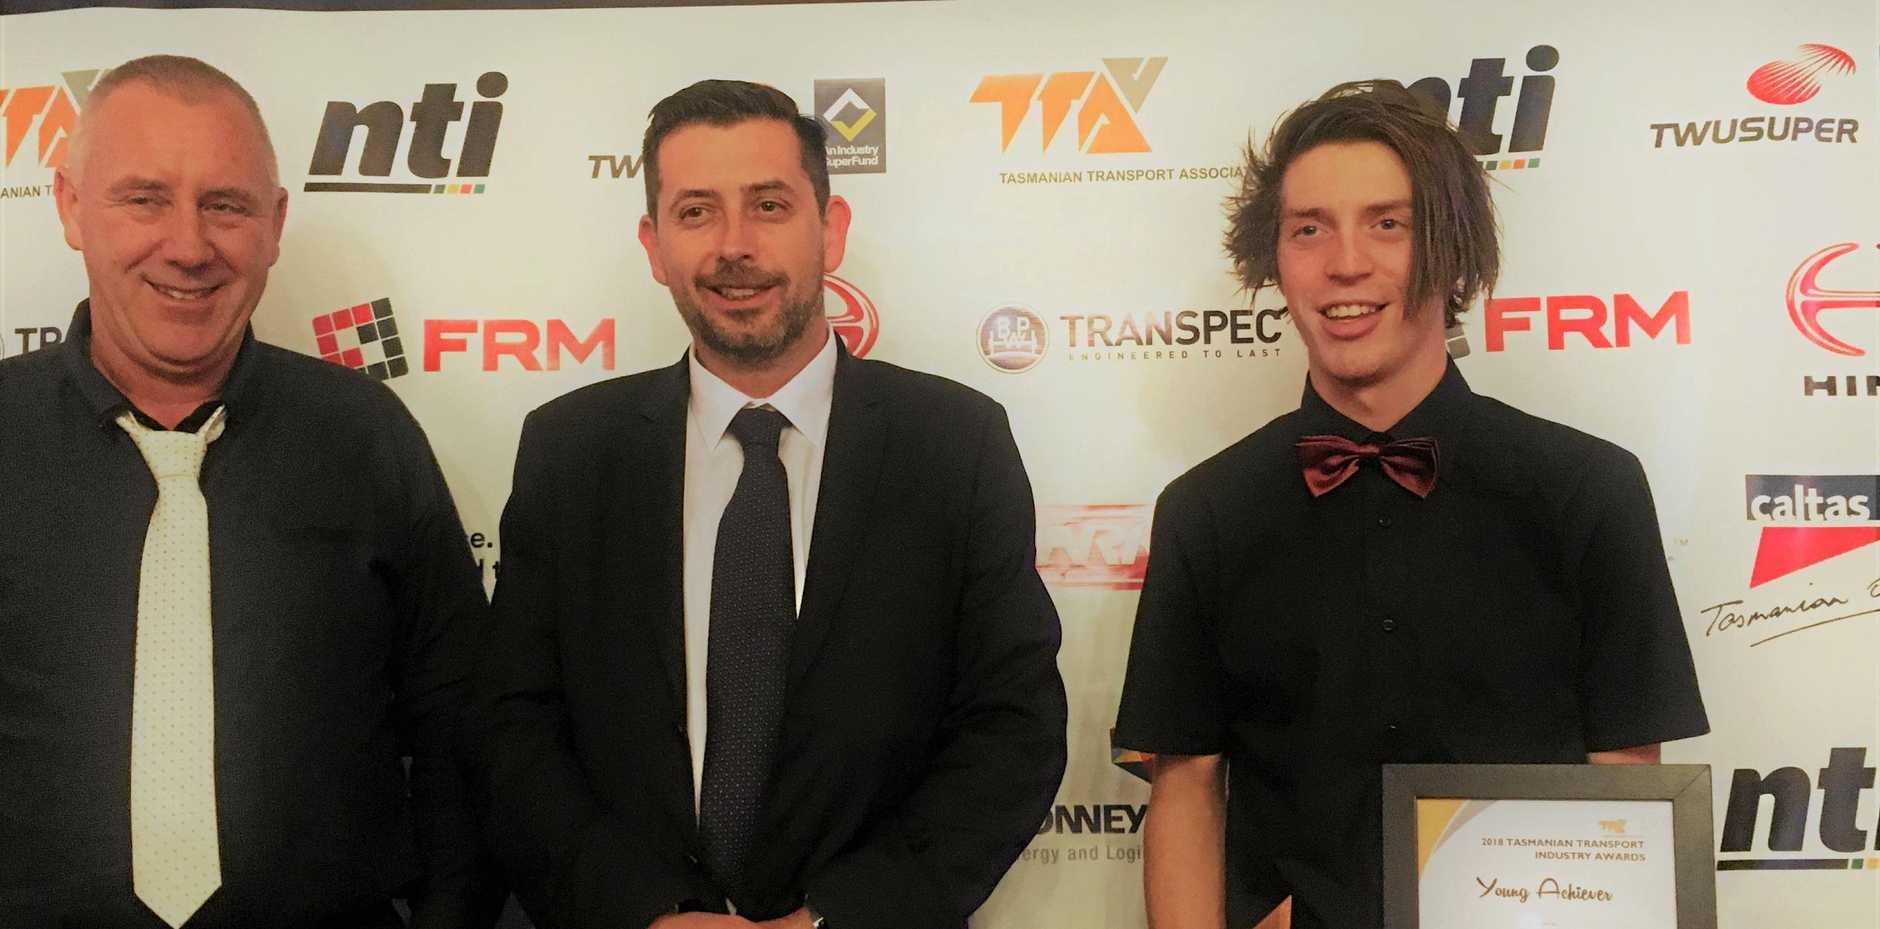 TOP HONOUR: Seton Broomhall (far right) receives his award at the Tasmanian Transport Association gala dinner.